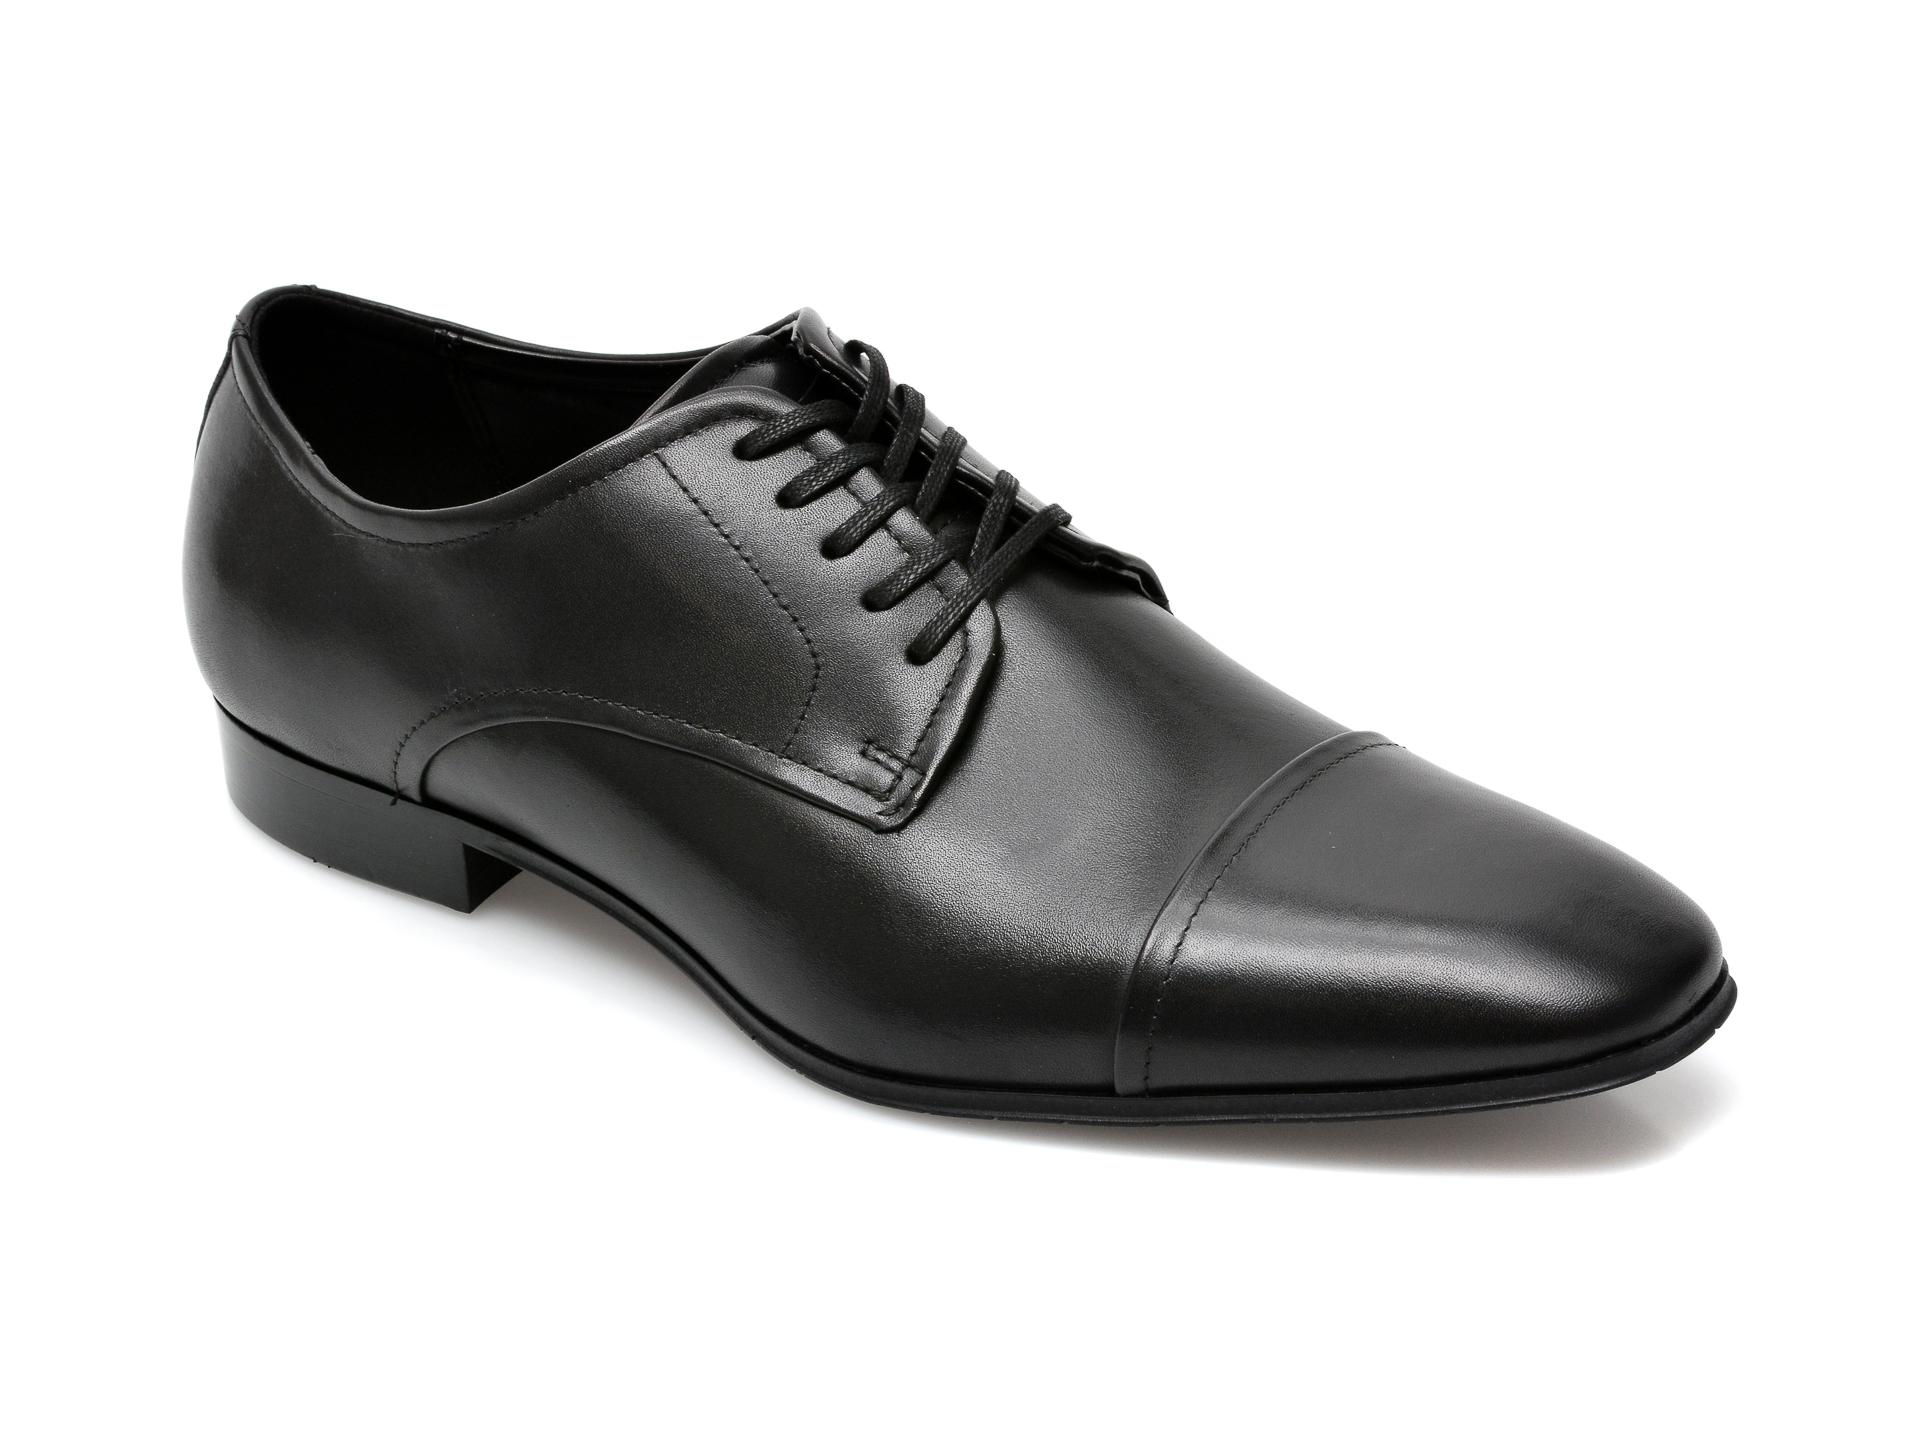 Pantofi ALDO negri, Cochico004, din piele naturala imagine otter.ro 2021